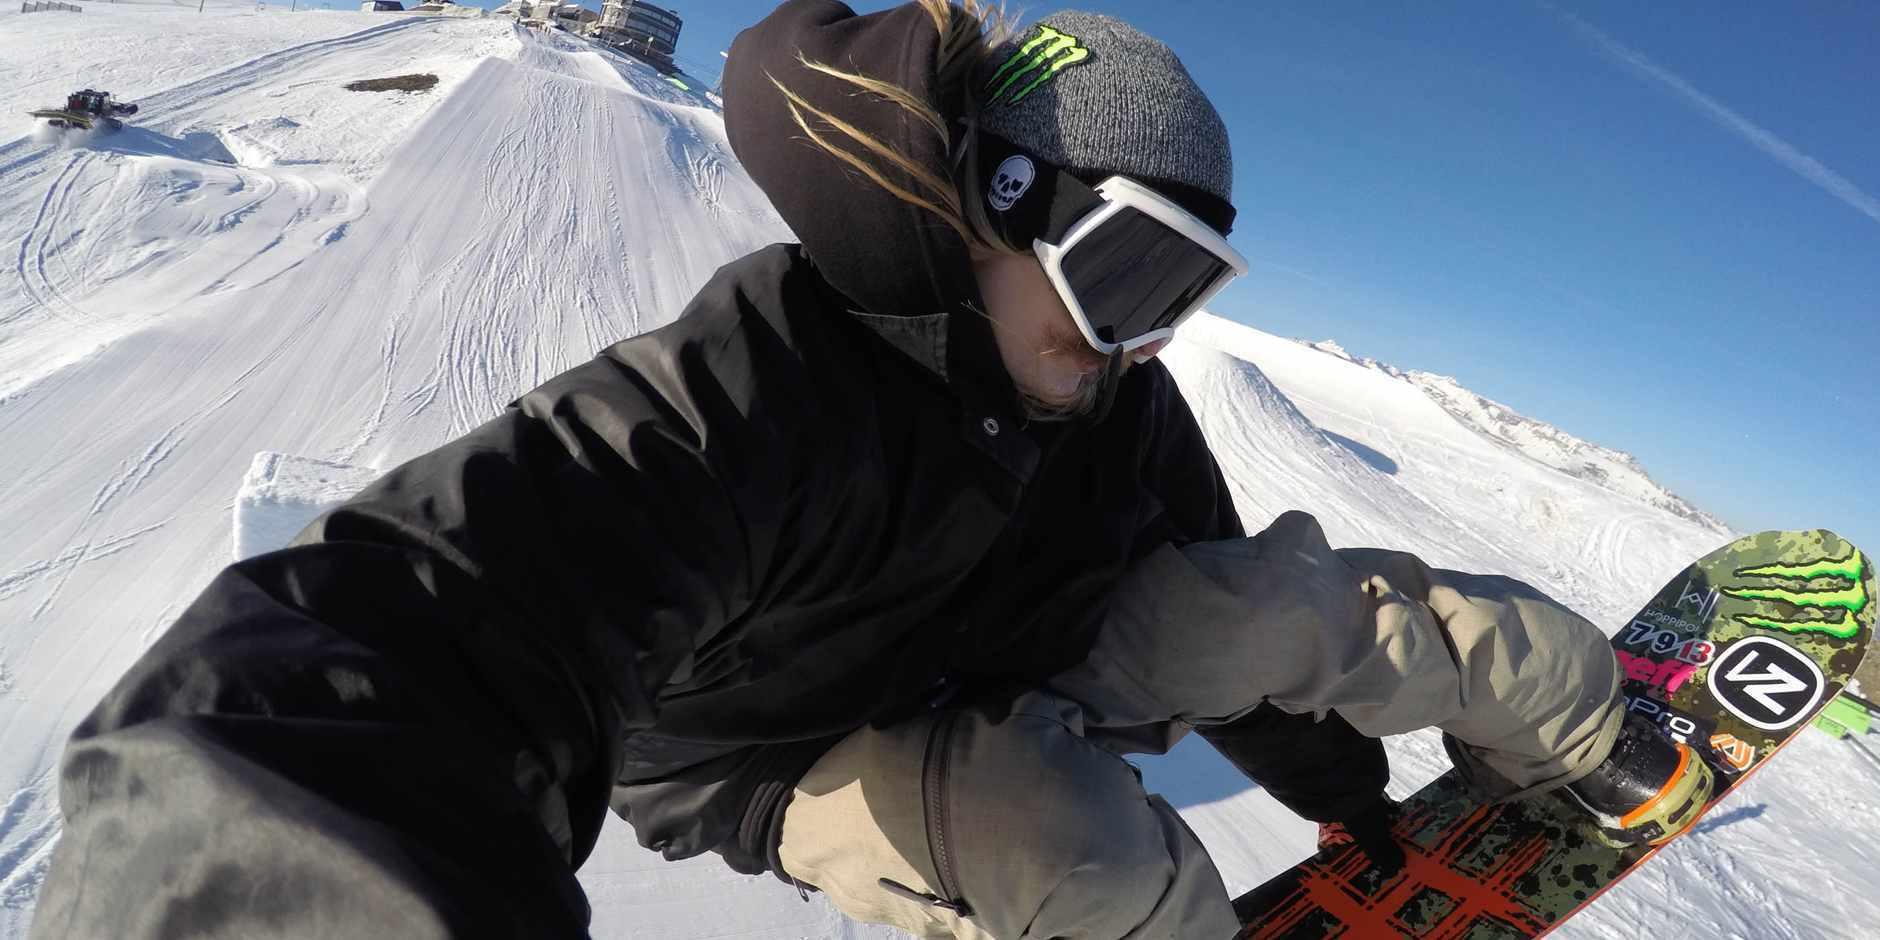 Крепление на руку GoPro Hand + Wrist Strap (AHWBM-002) сноуборд